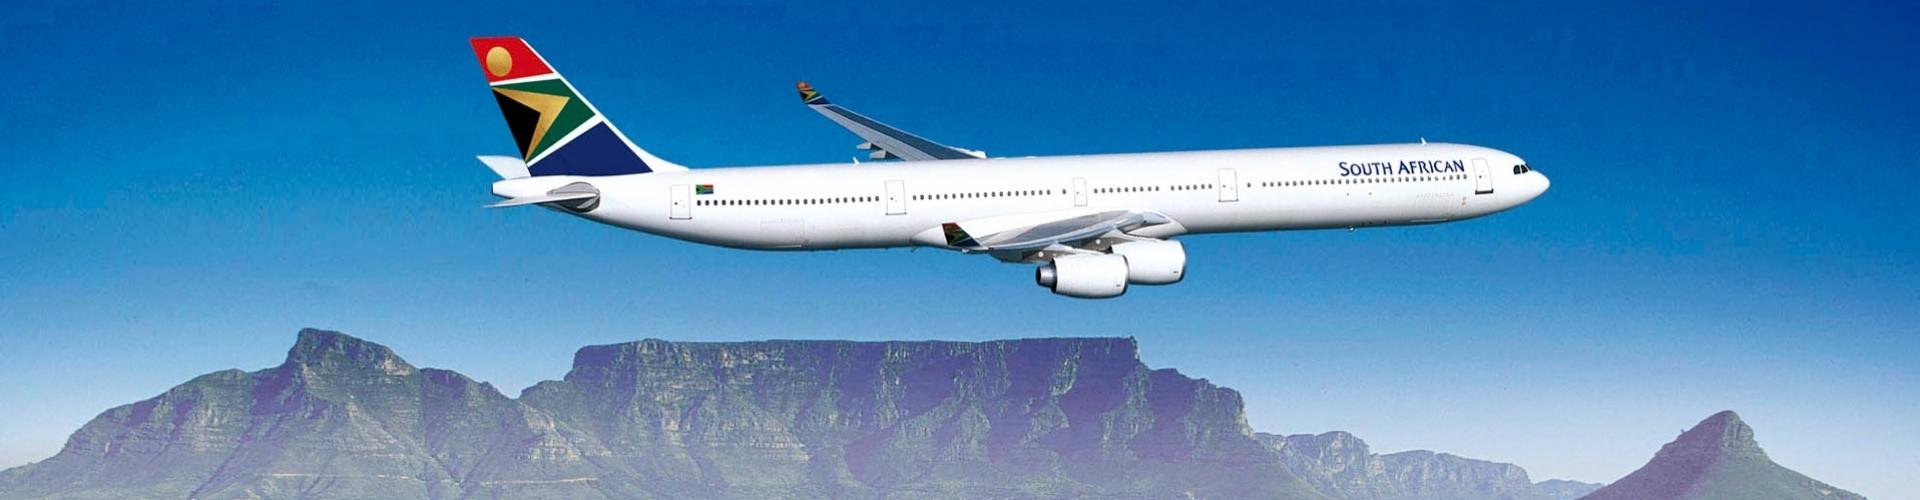 header-geen-jetlag-in-zuid-afrika-1920x500-1